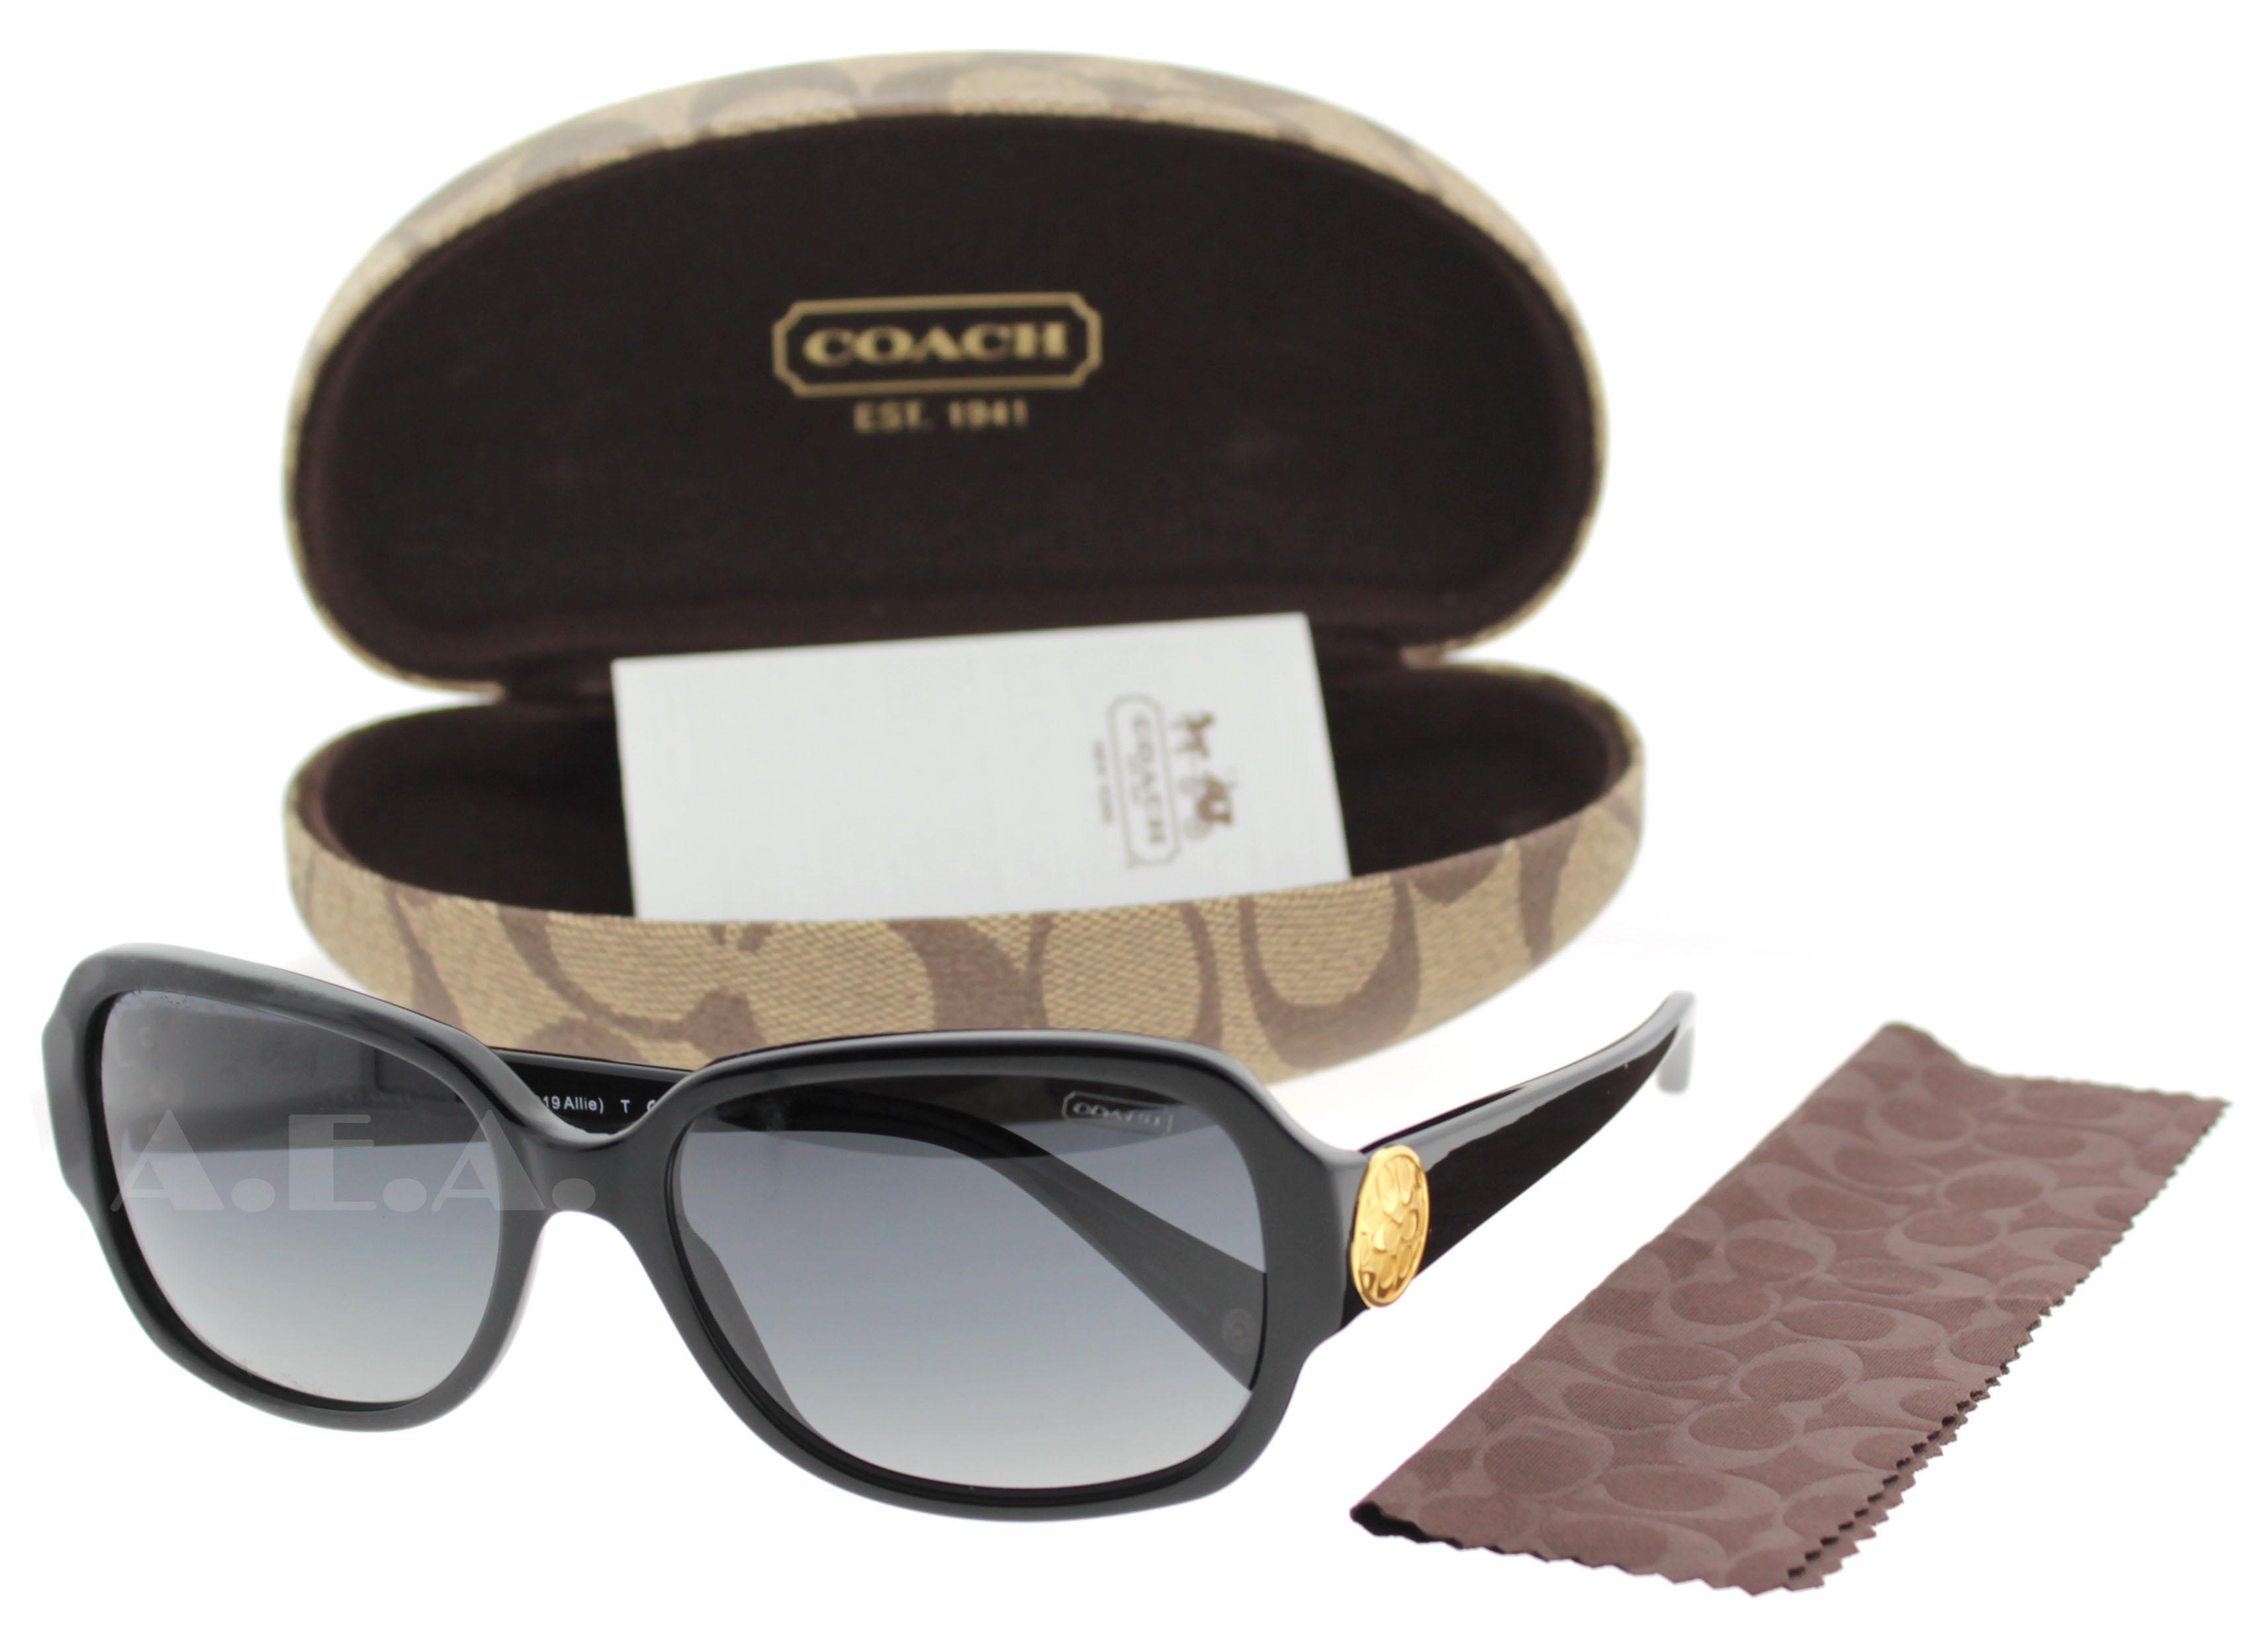 3073f68bceb0 Coach - Coach HC8015 L019 Allie 5002/T3 Polarized Black/Gold Women's  Sunglasses - Walmart.com